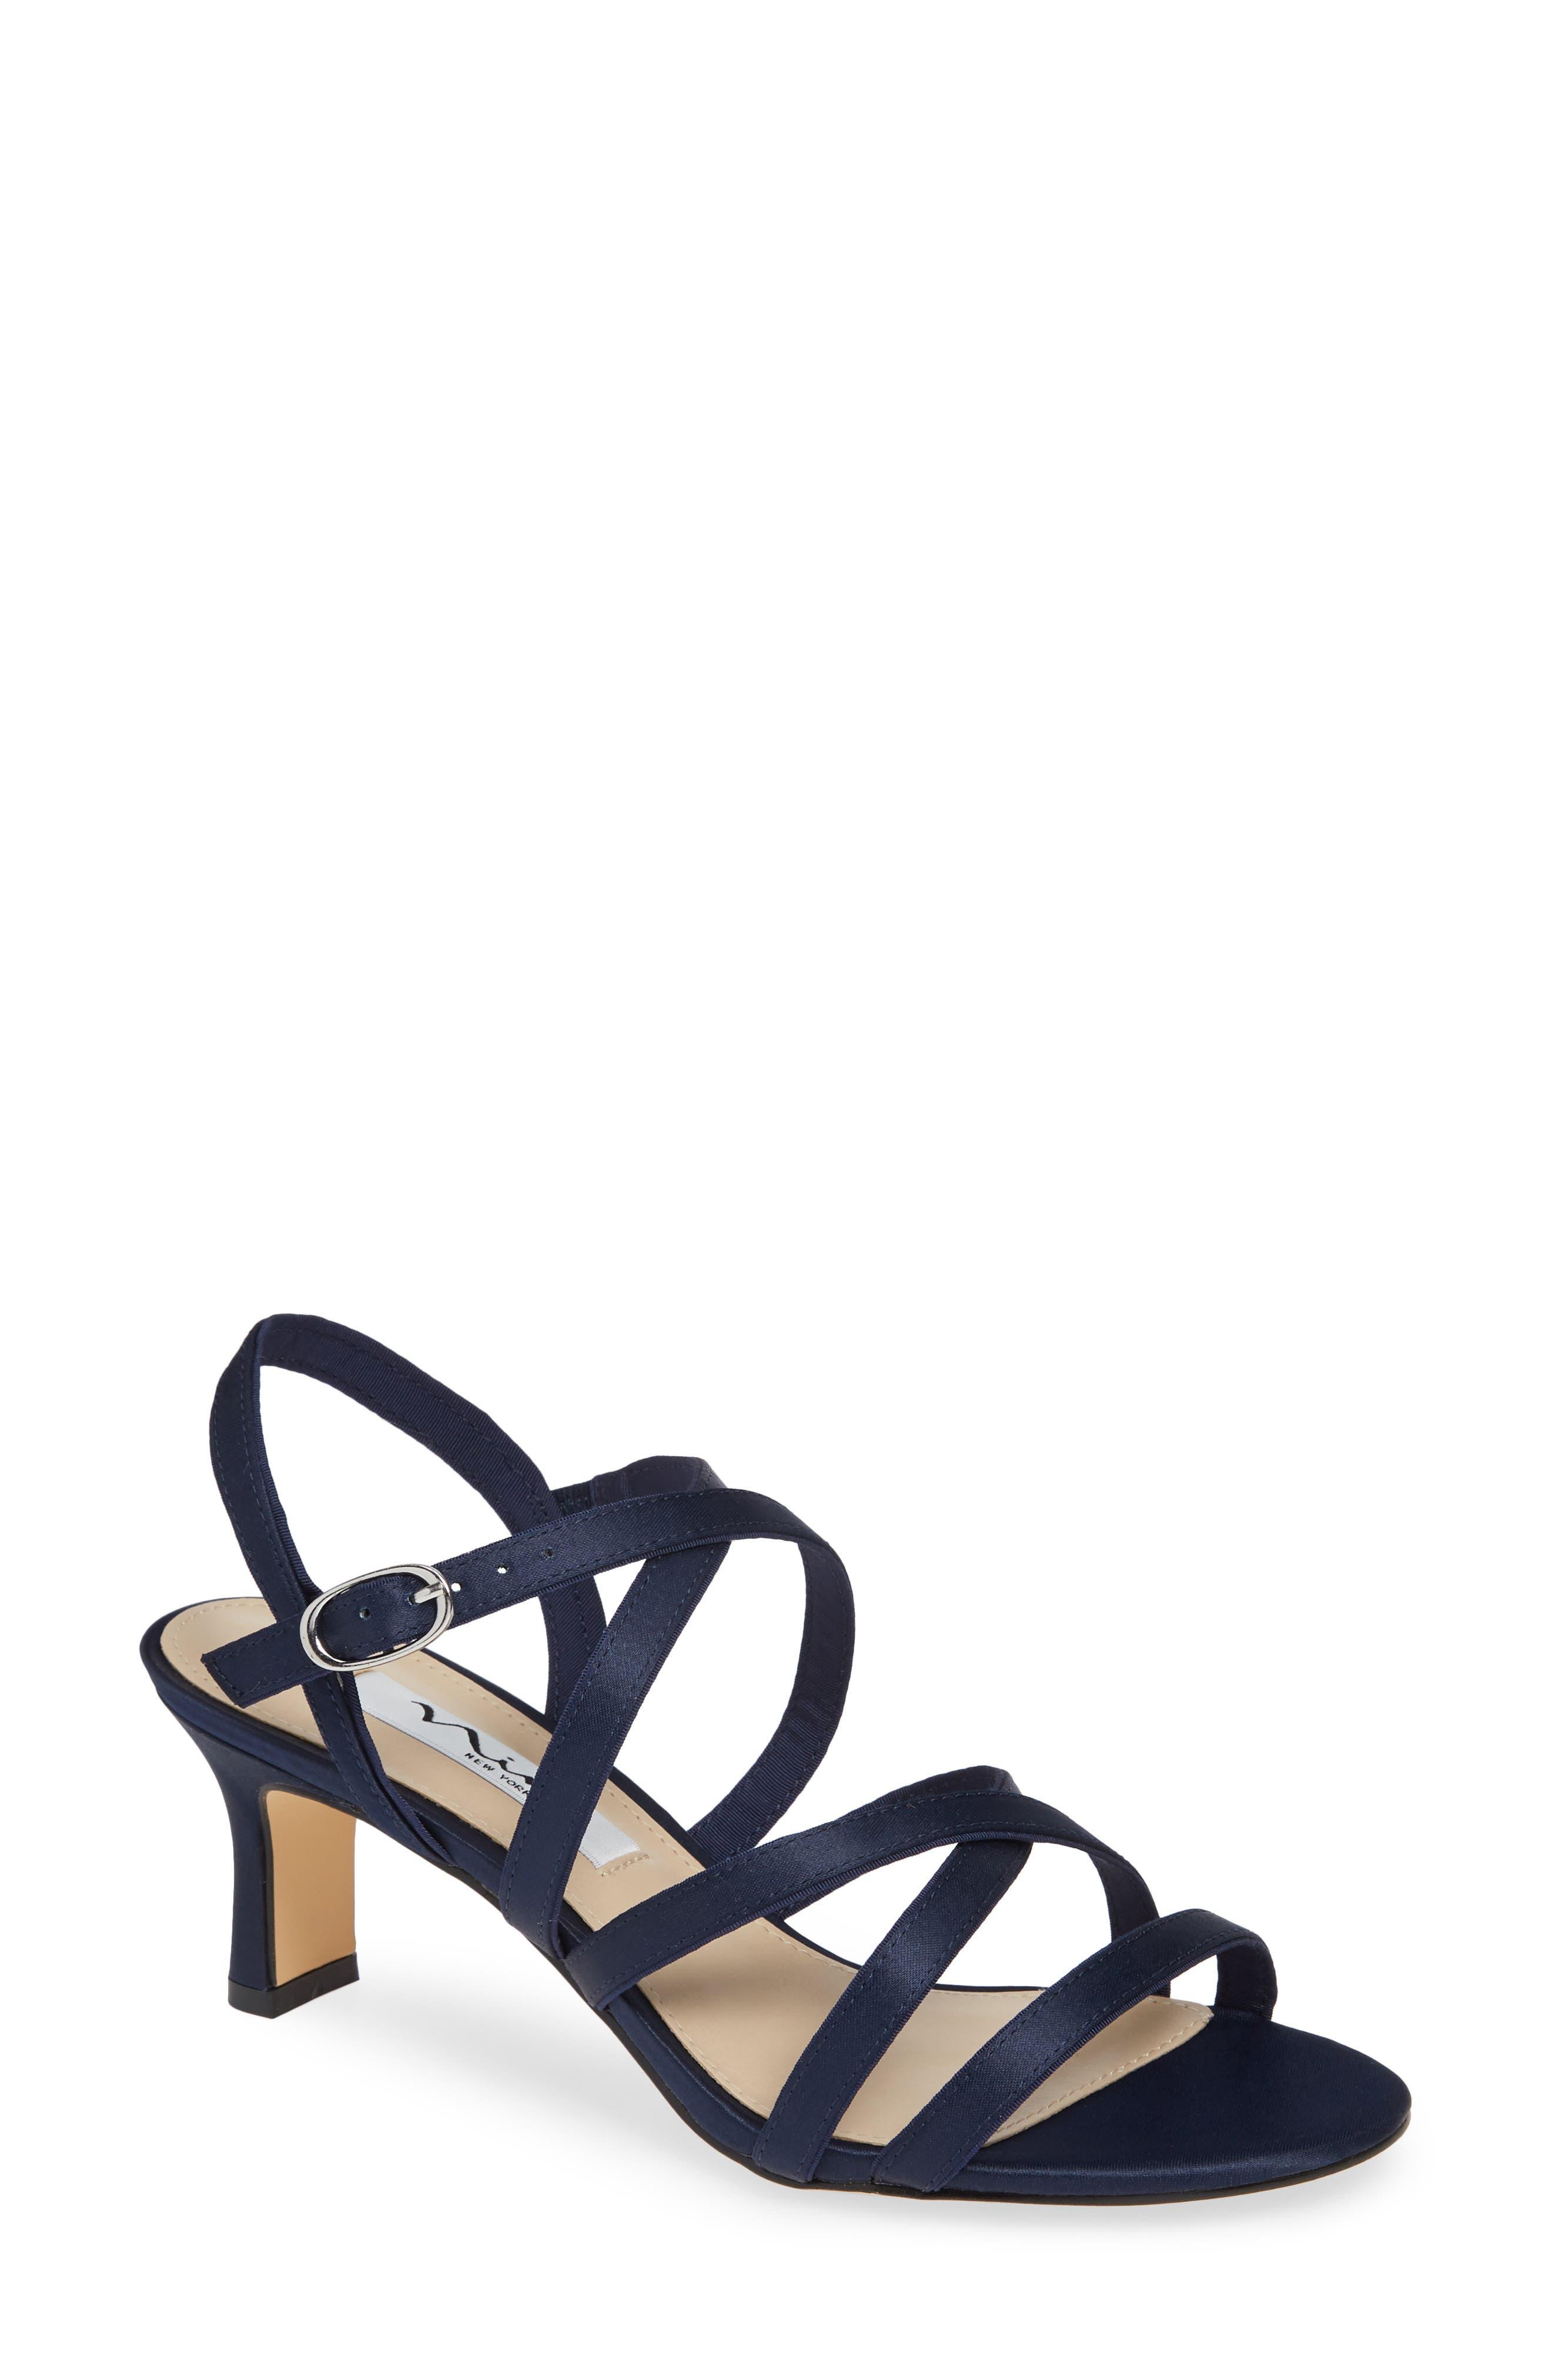 Genaya Strappy Evening Sandal,                         Main,                         color, Navy Satin